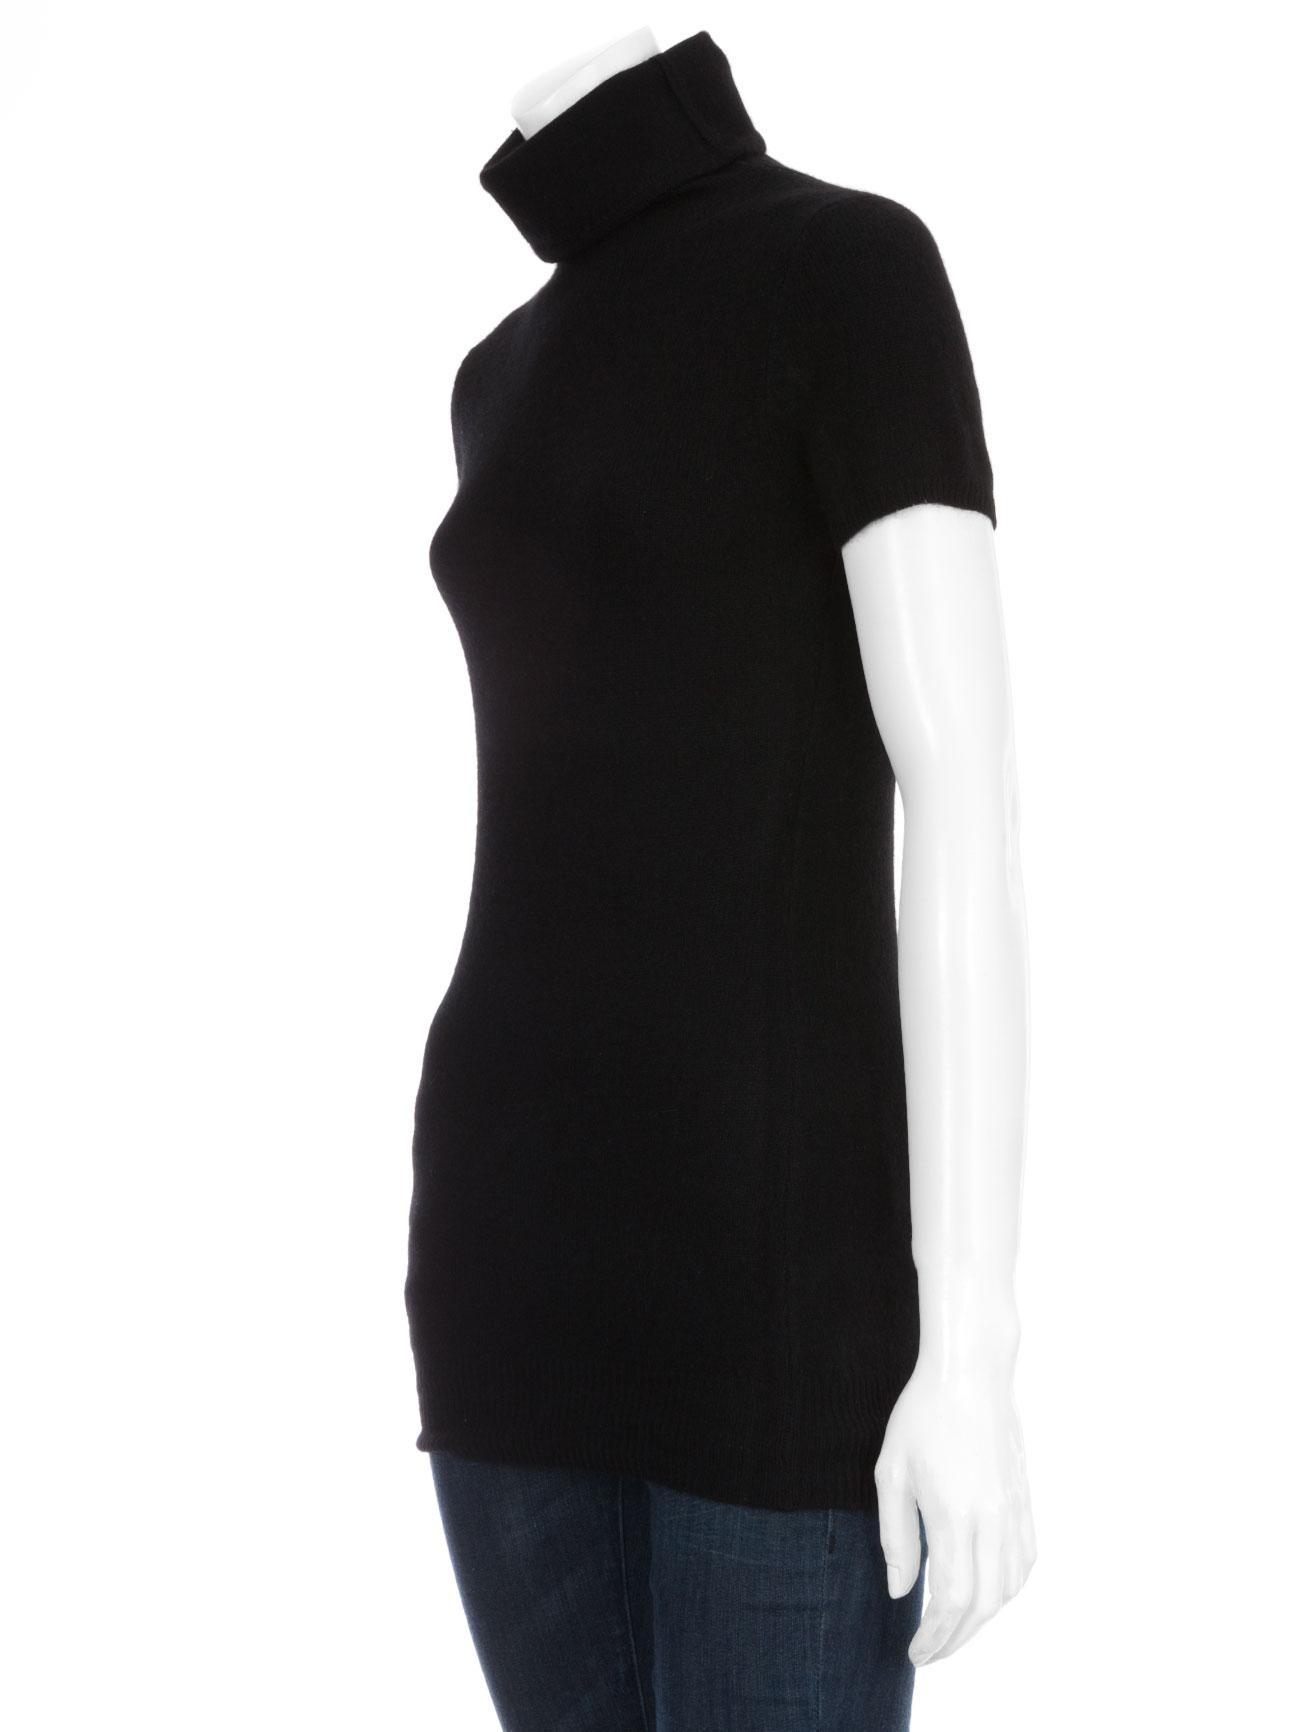 Womens Mock Turtleneck Short Sleeve Shirts